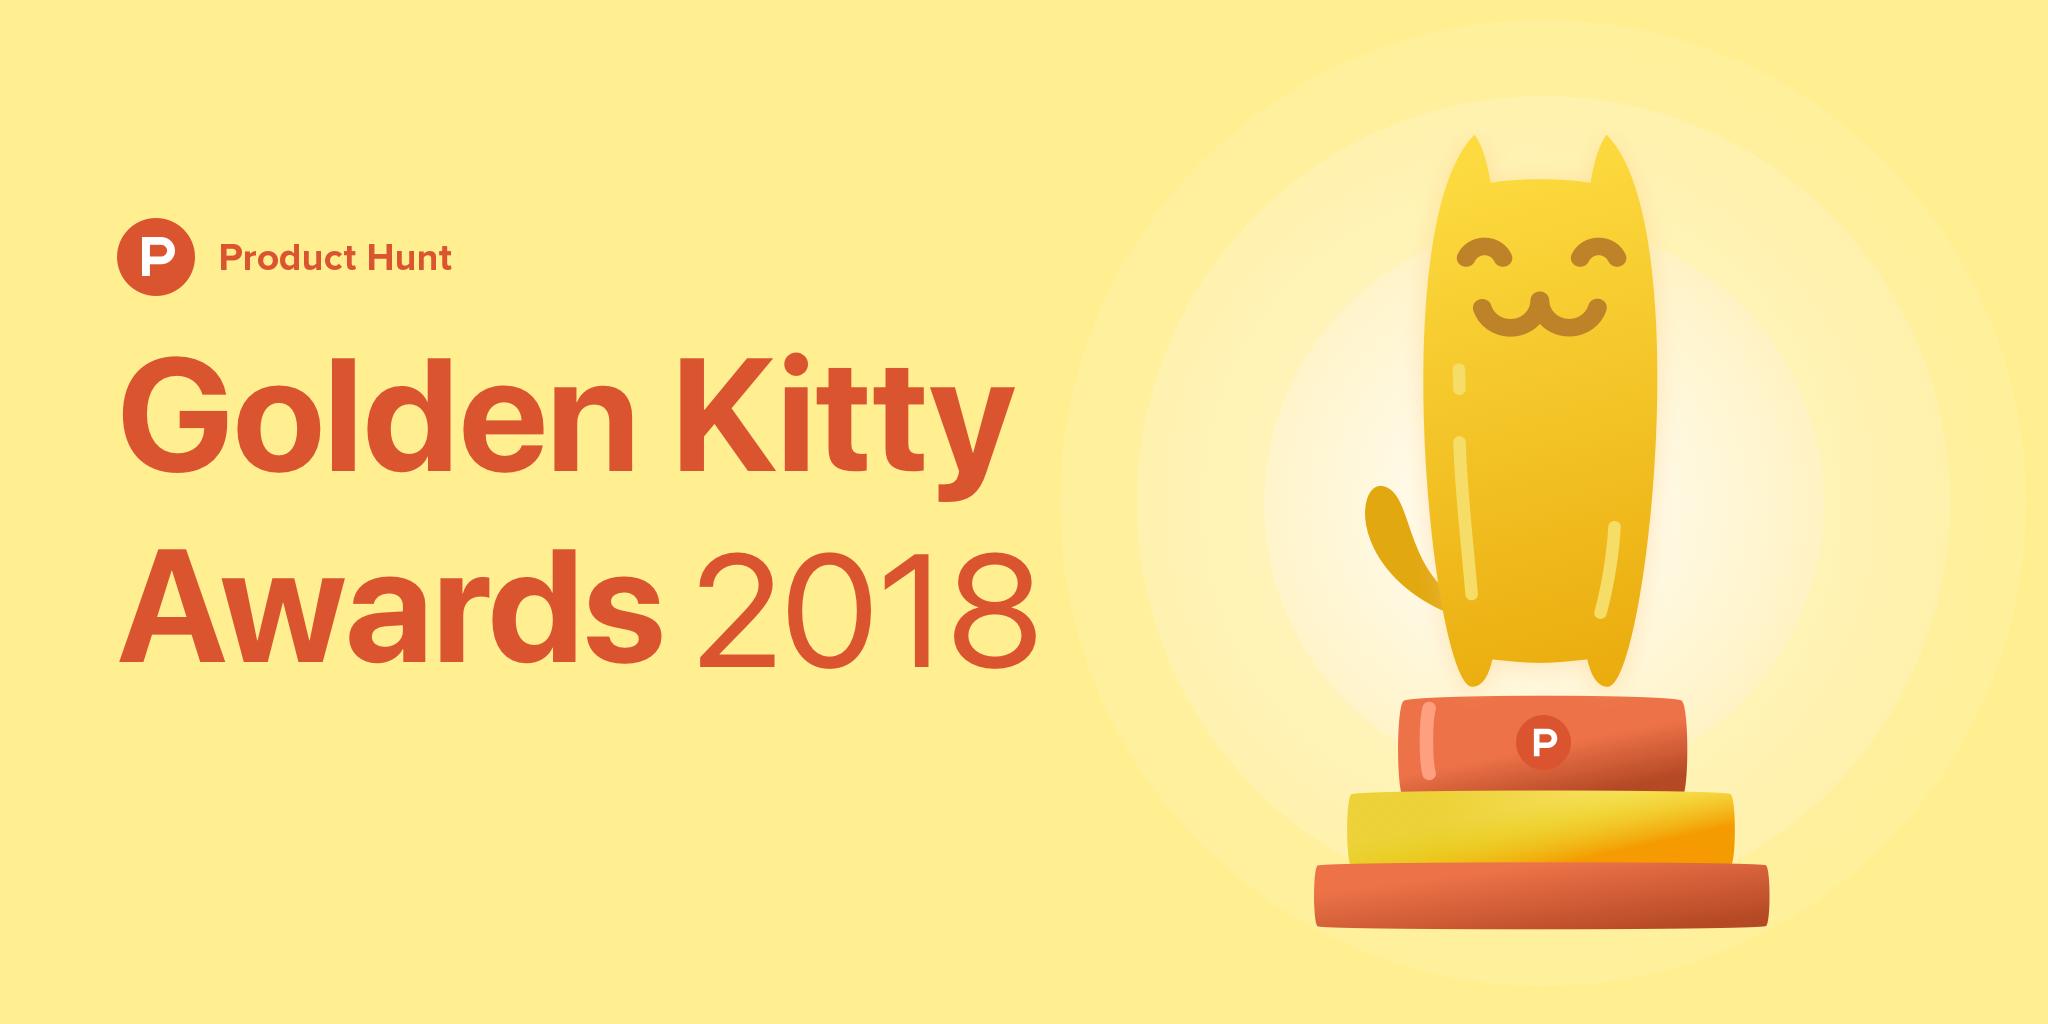 Product Hunt Golden Kitty Awards 2018